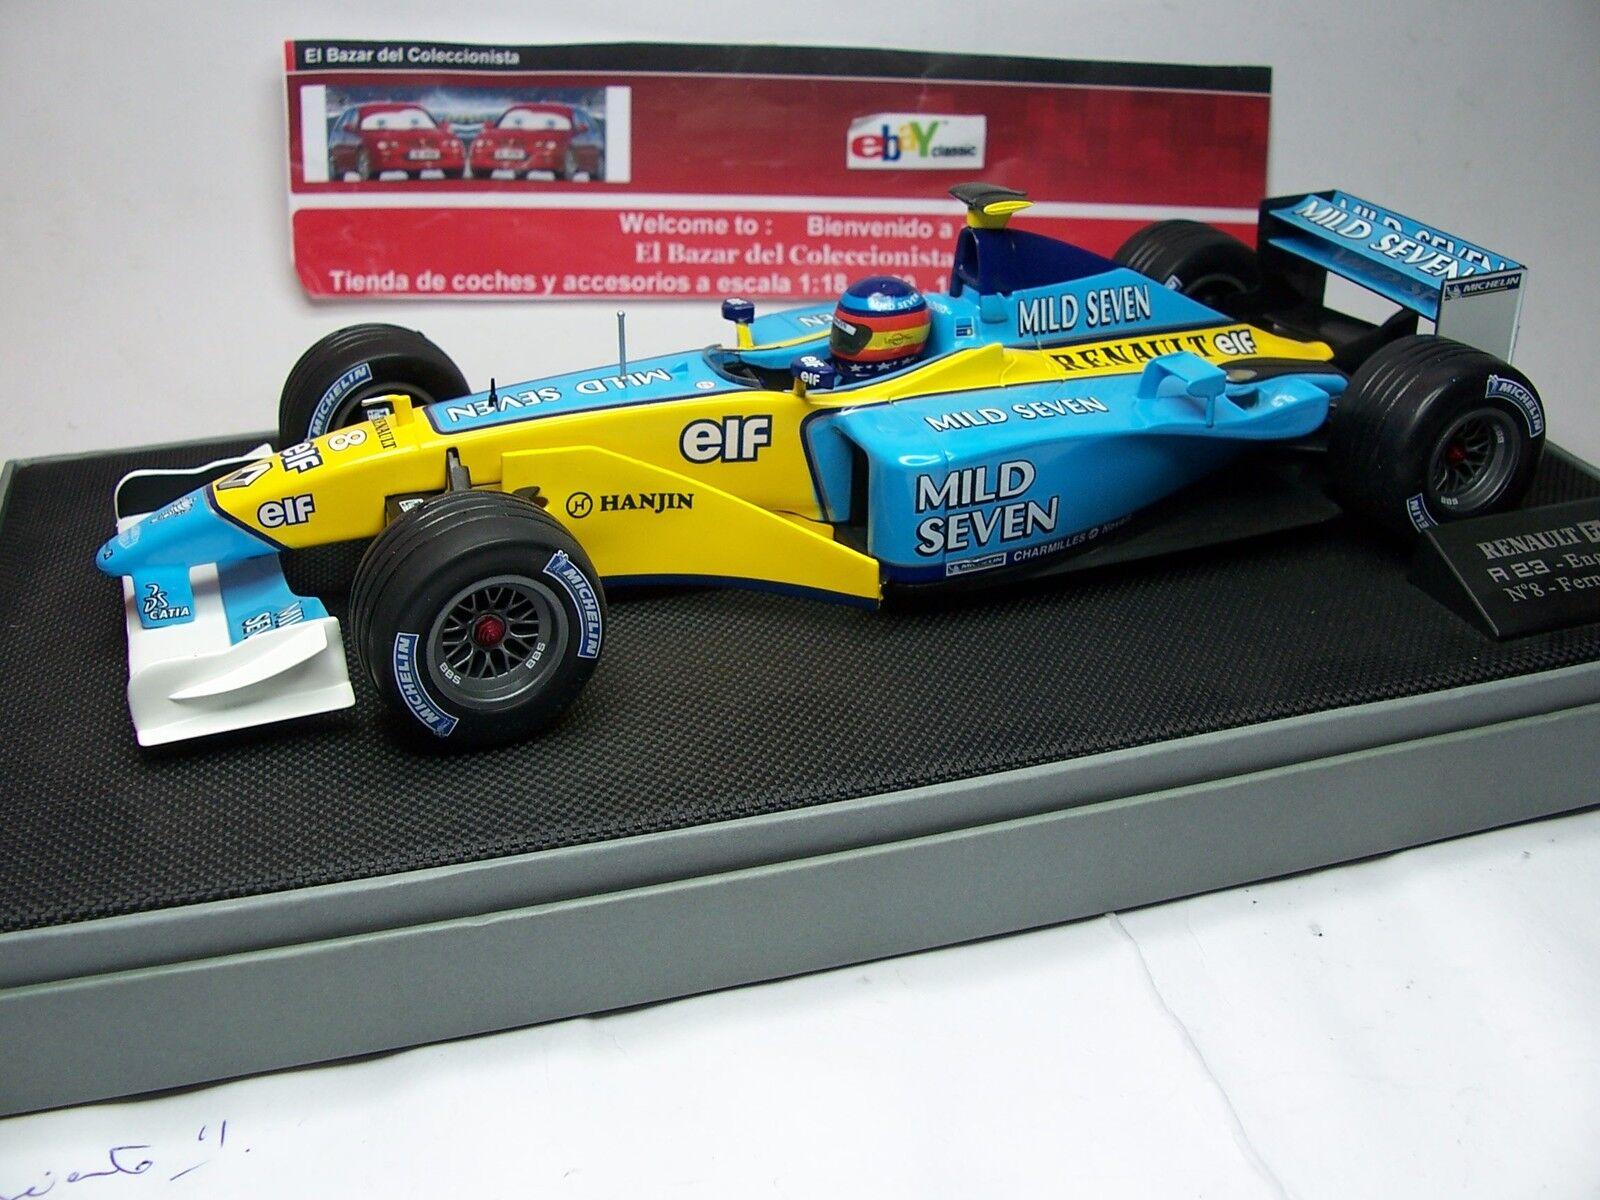 Renault F1 R202 RS23 Alonso  Mild 7 - 2018 Test driver  car  - UH - 3L 050